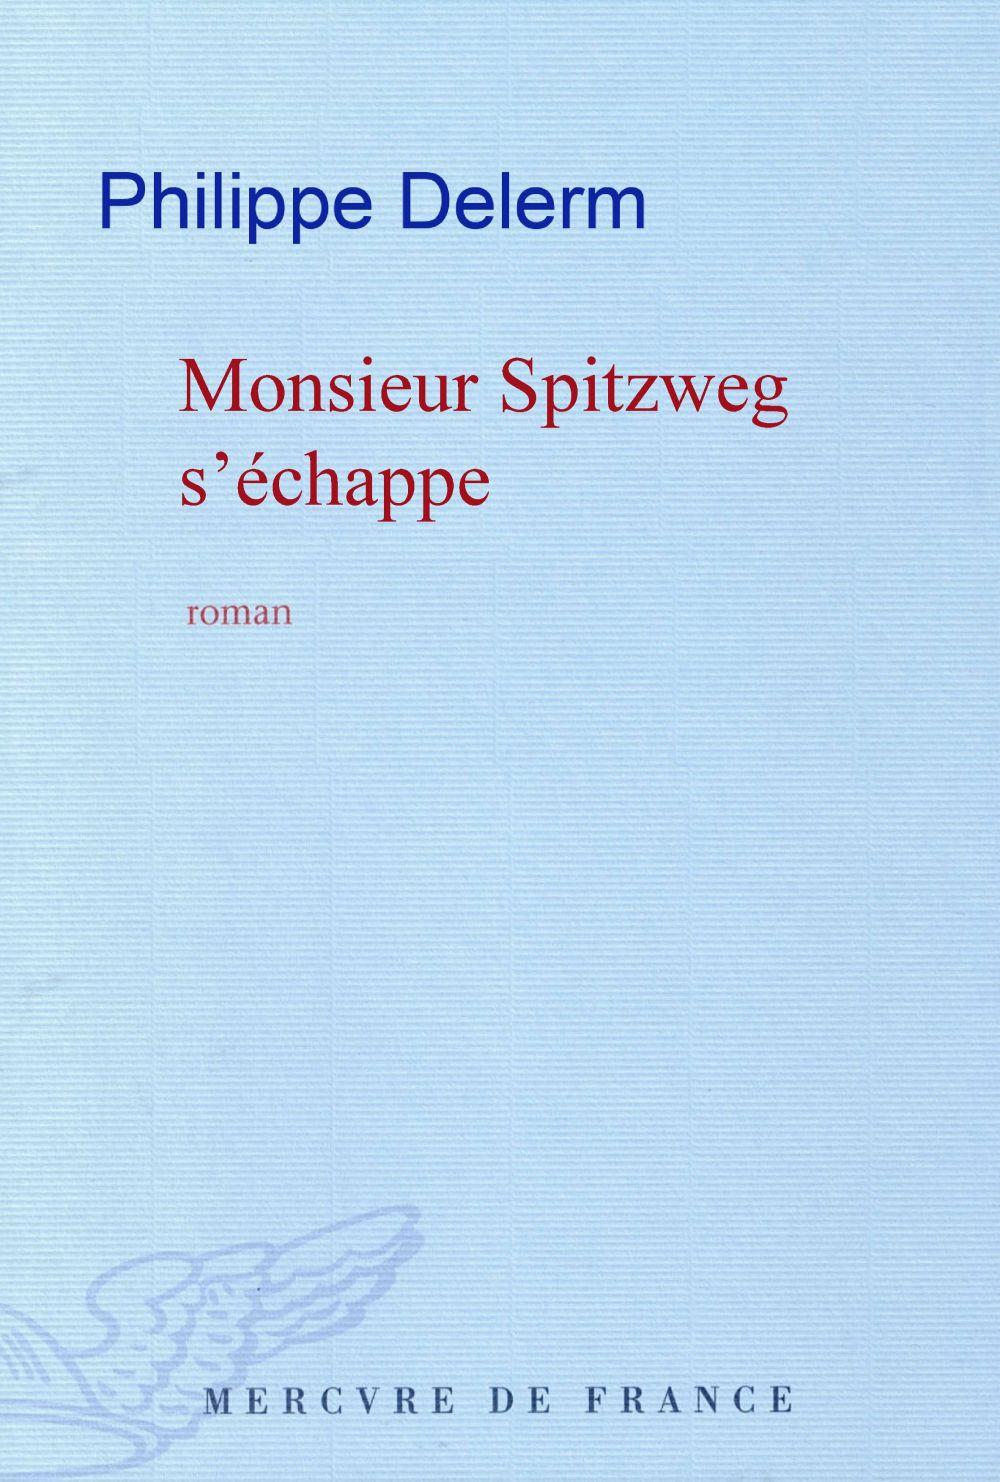 Monsieur Spitzweg s'échappe |